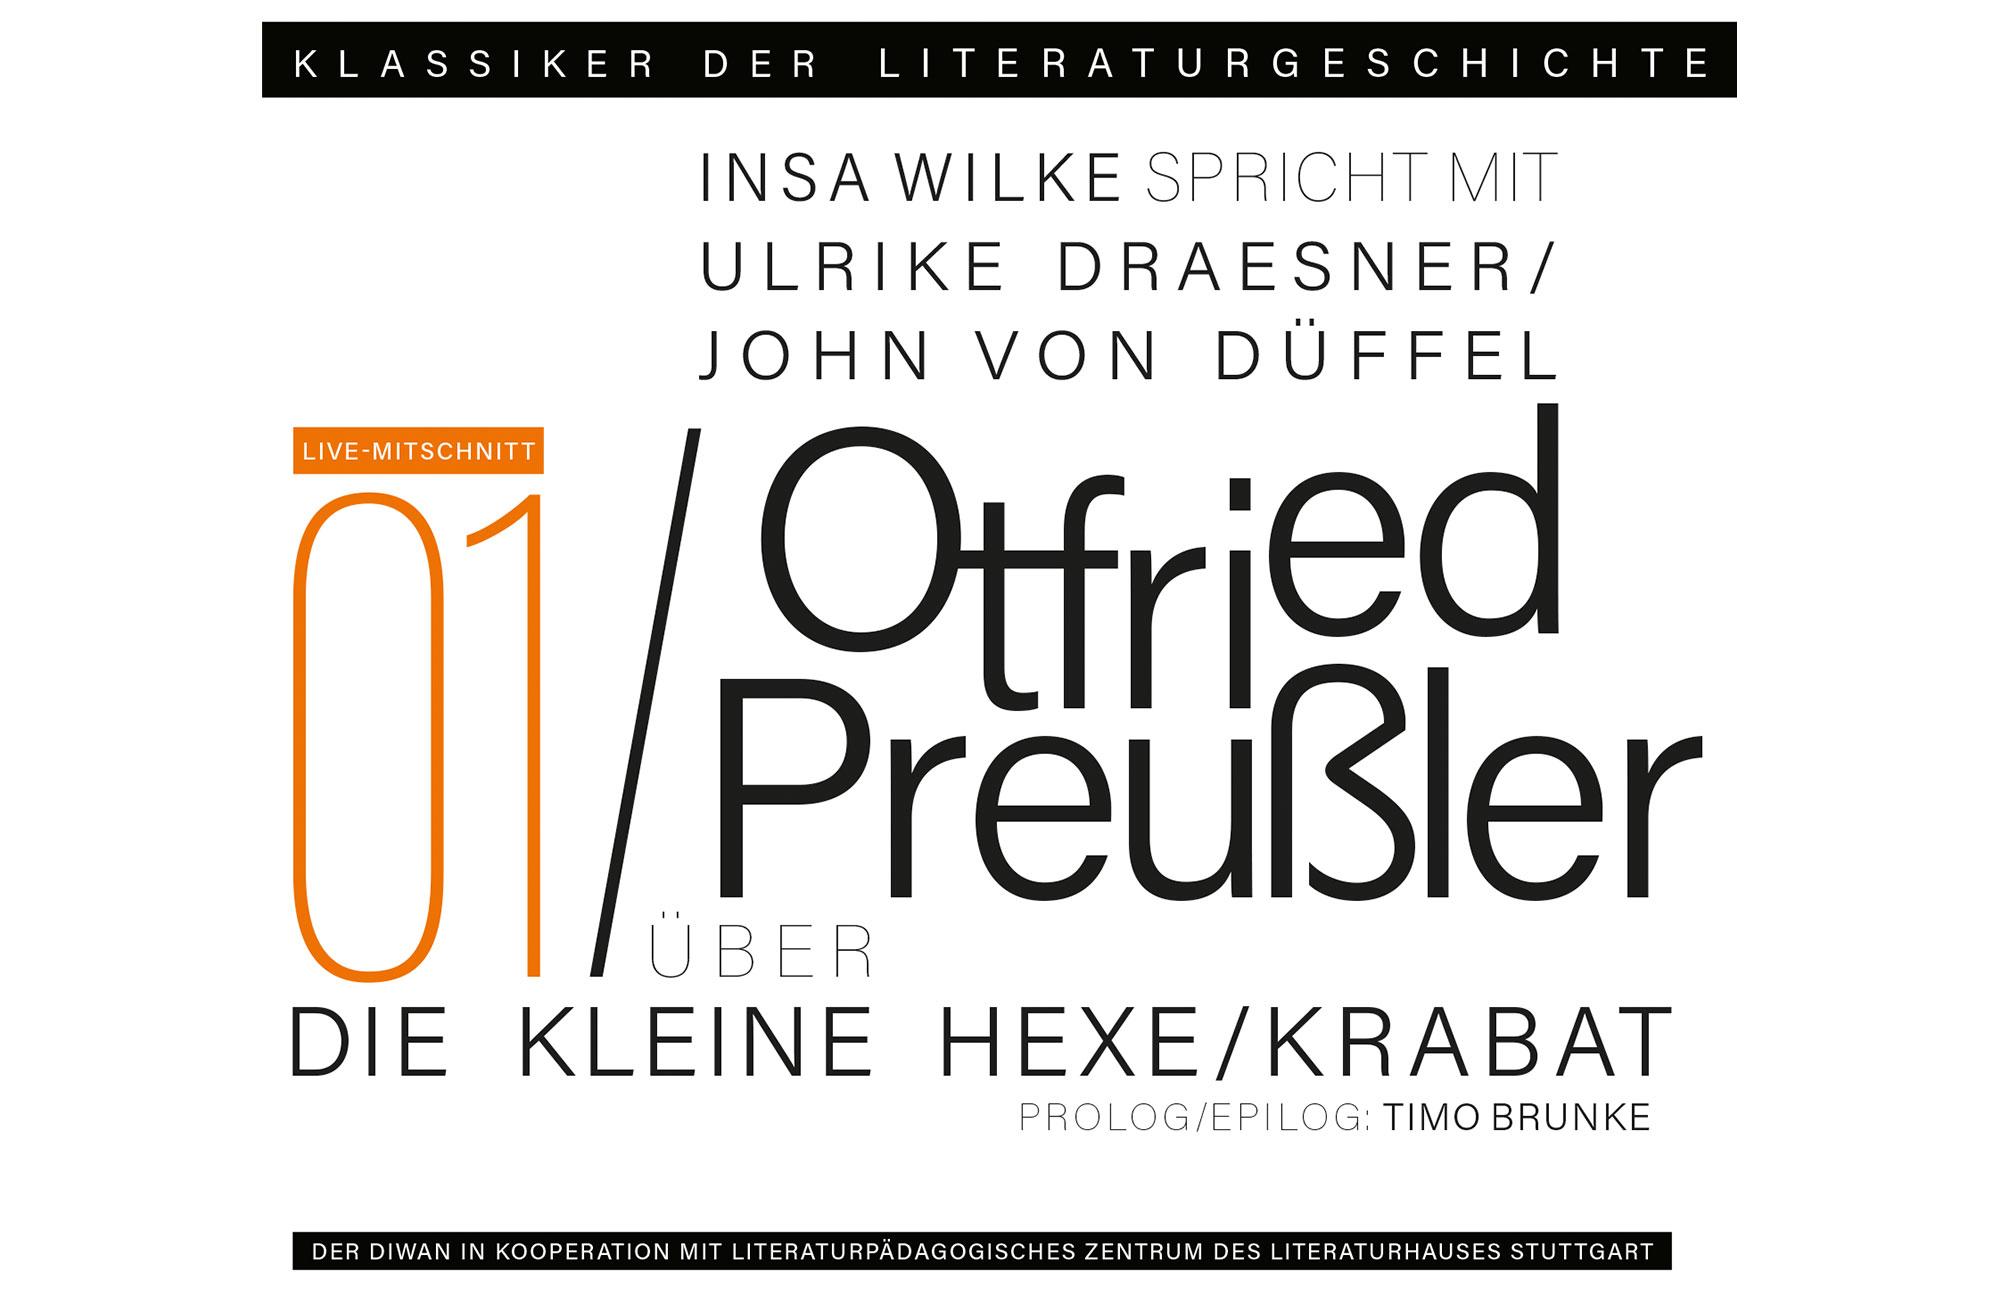 Klassiker der Literaturgeschichte: Otfried Preußler